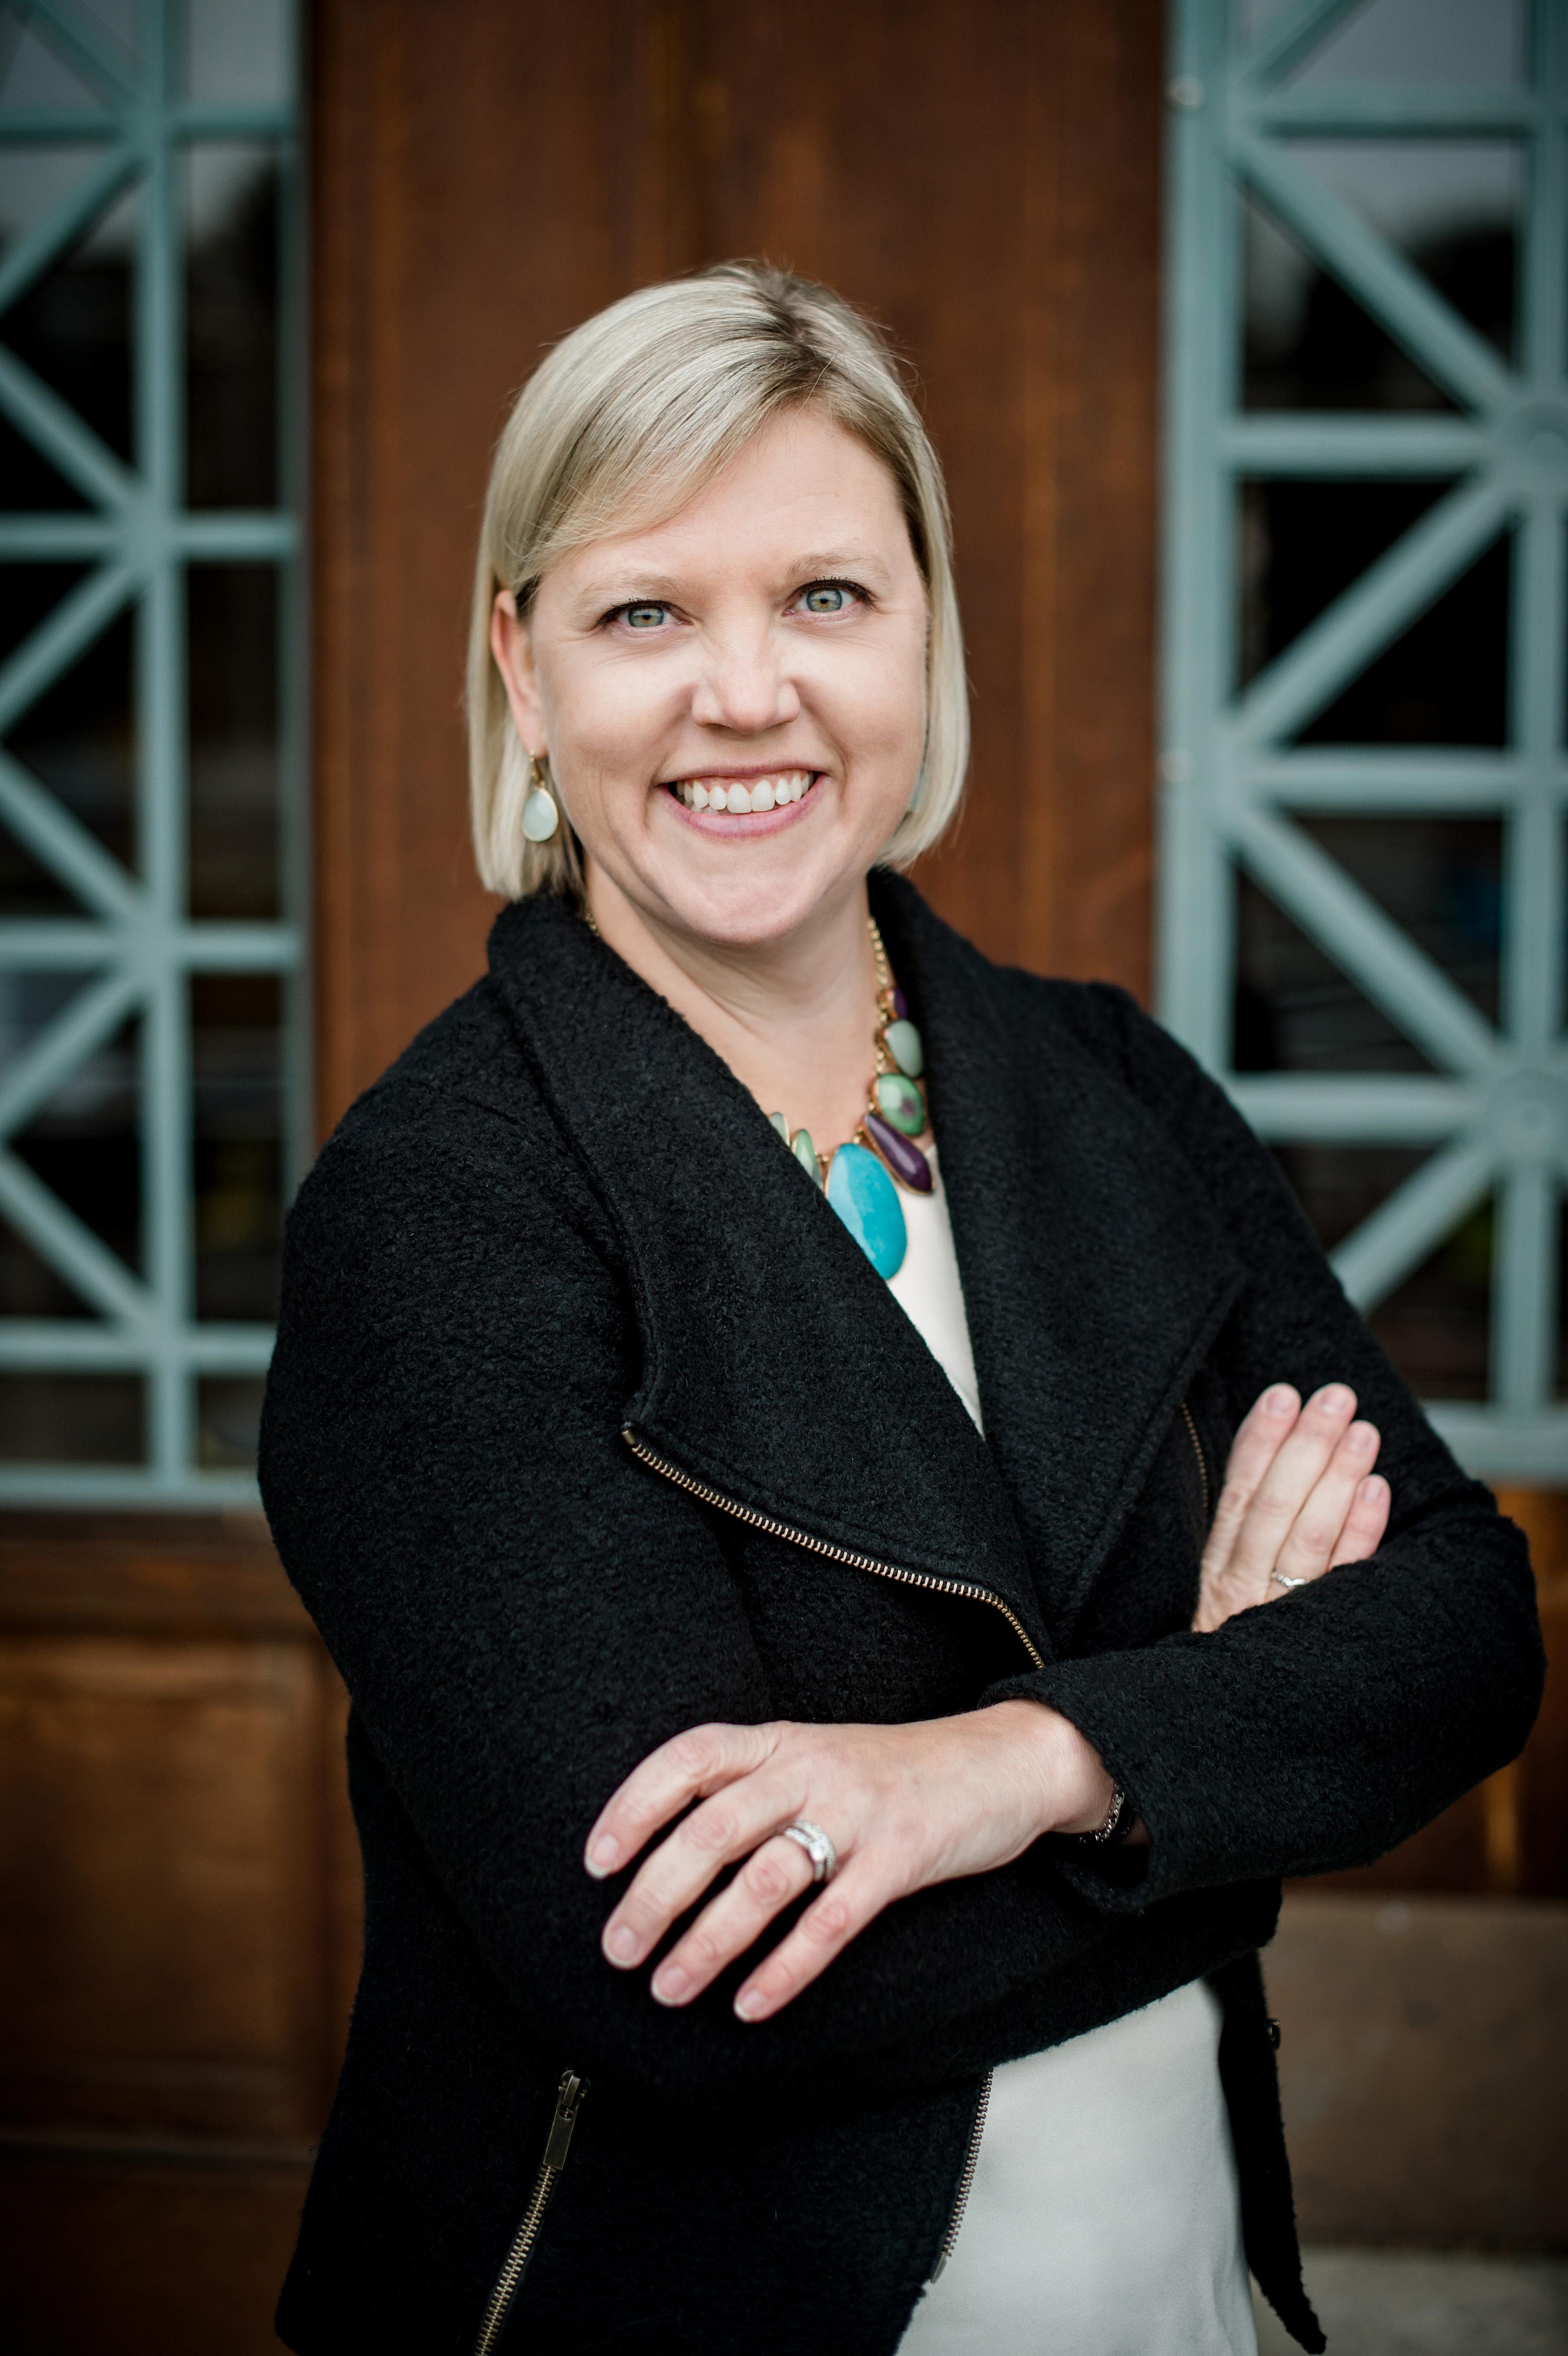 Andrea Hettinga Kearns